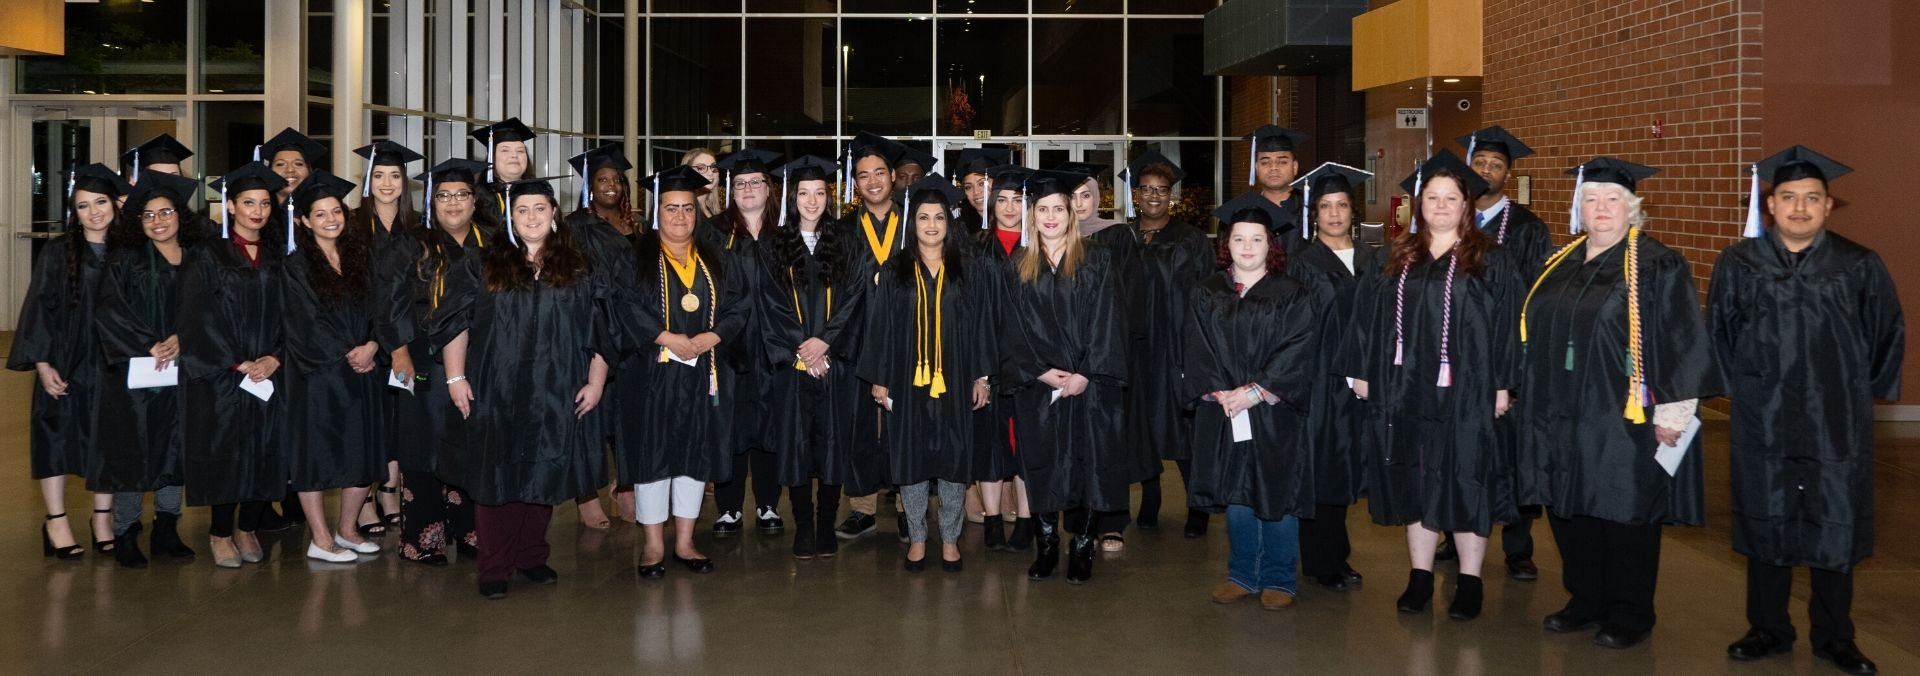 charter college graduates